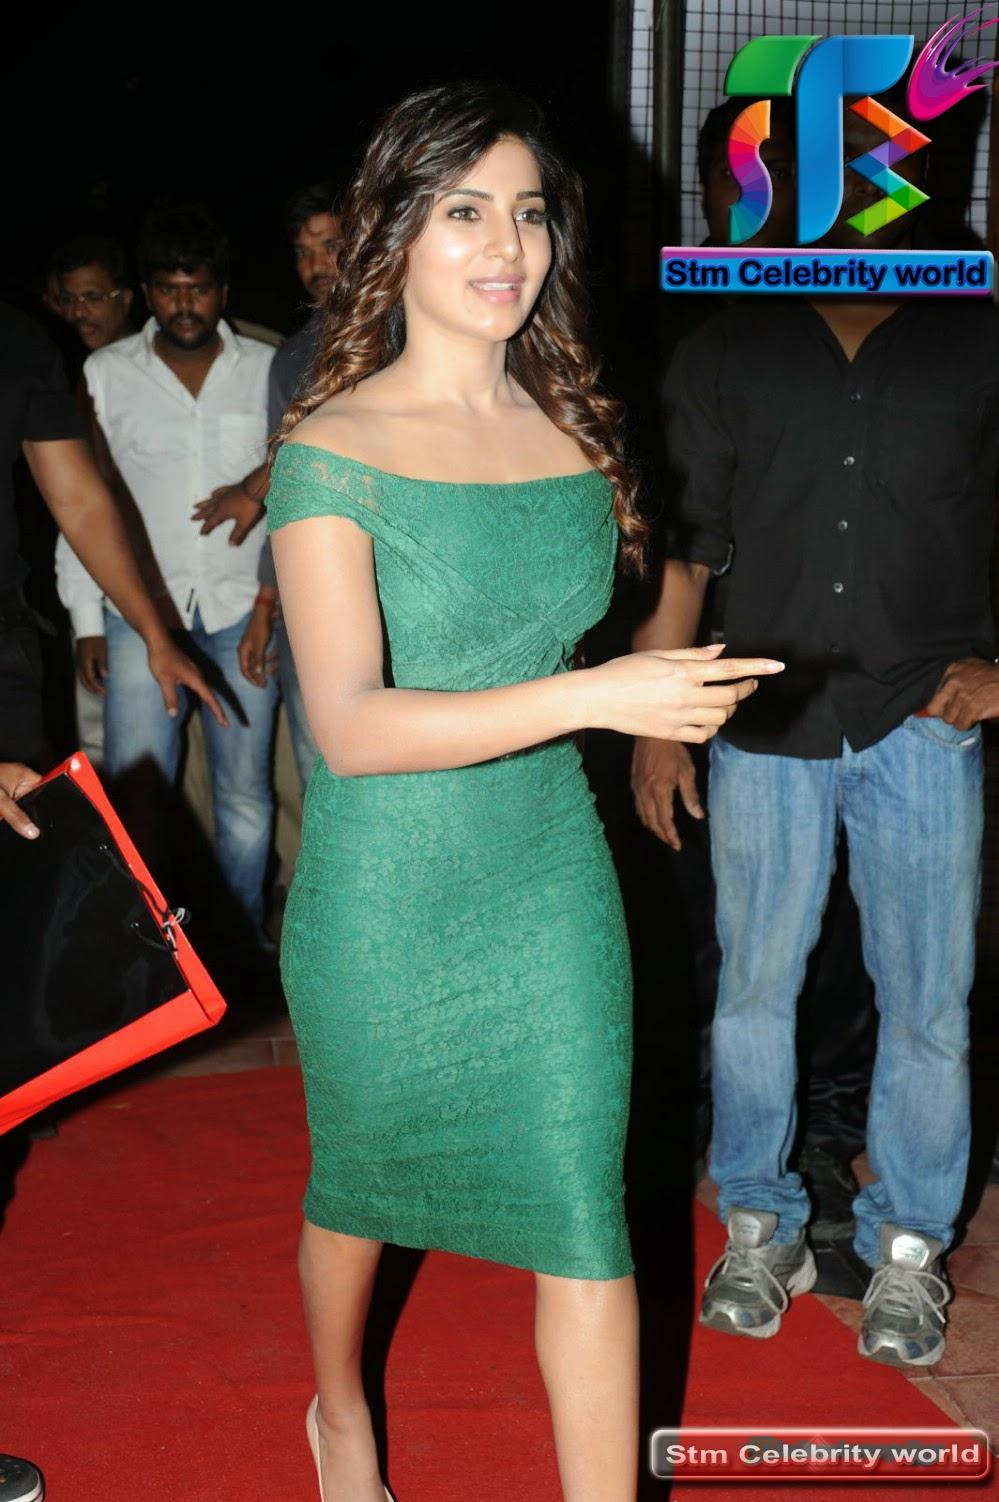 Tamanna Hd Wallpapers Free Download Samantha Tight Sexy Dress Latest Hot Hd Photos And Wallpaper